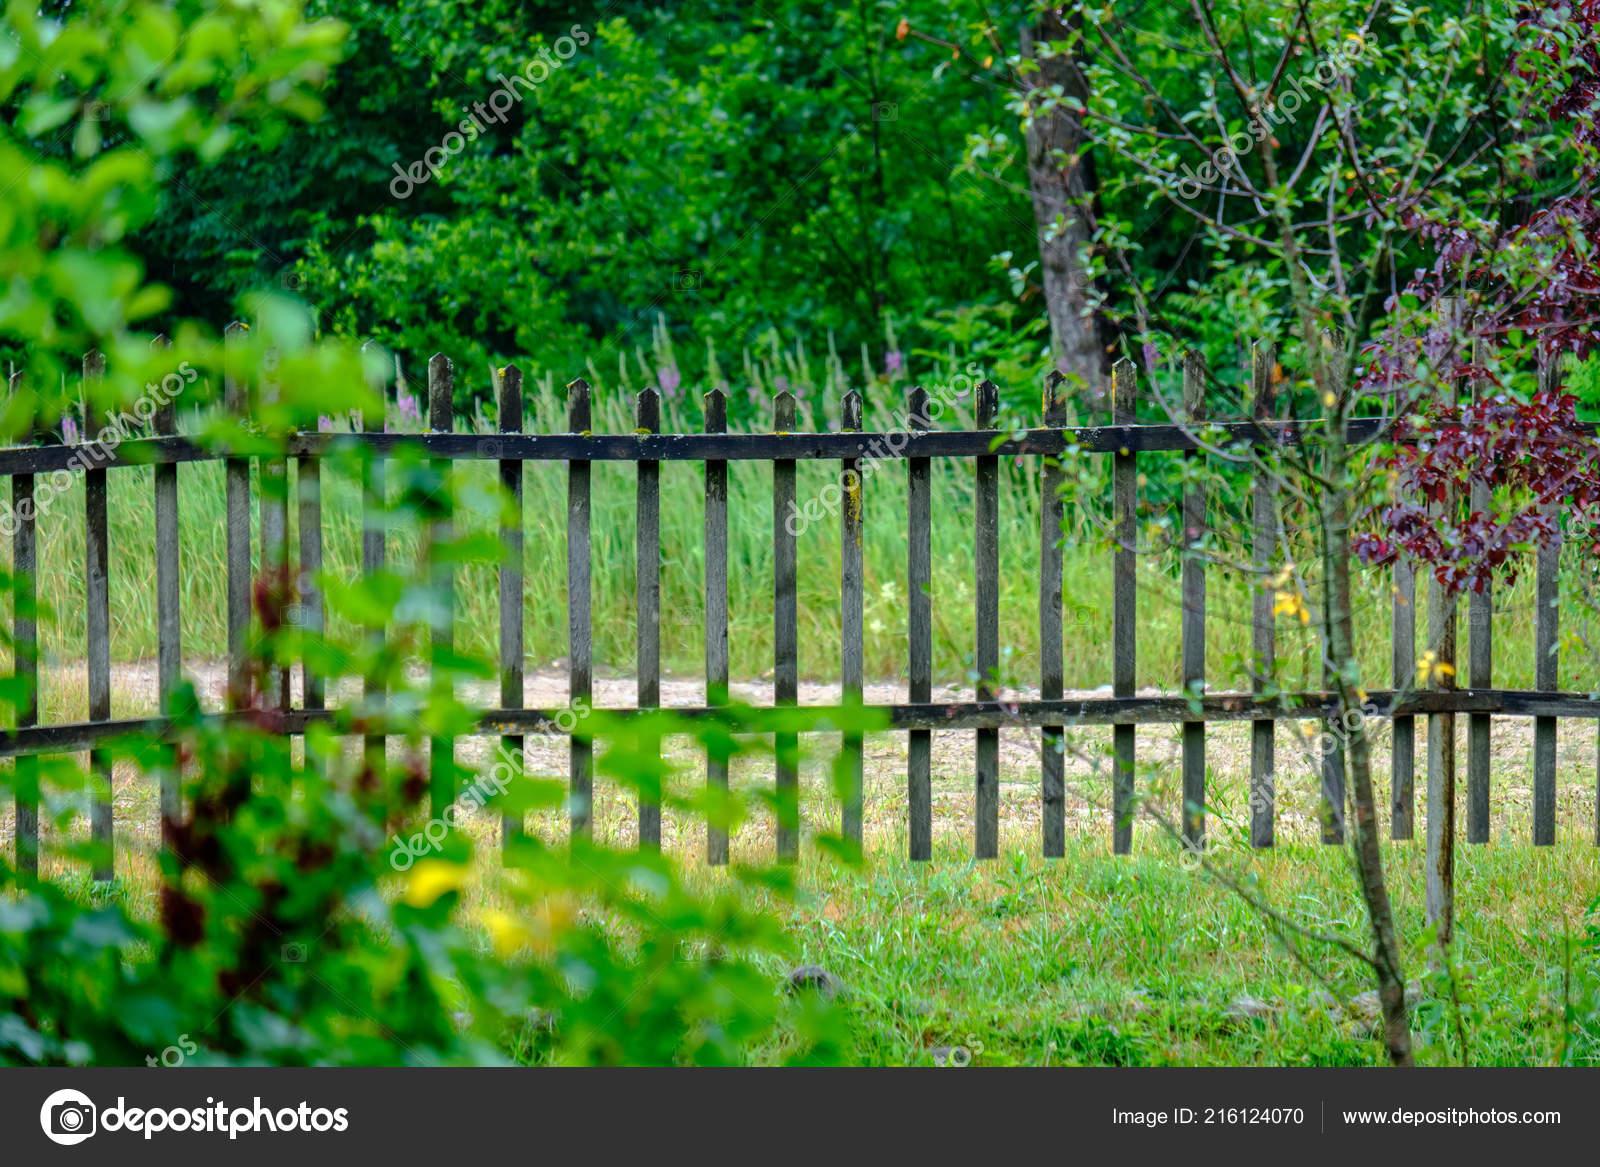 Houten Hekwerk Tuin : Oude houten hek tuin het platteland met ochtends licht groen